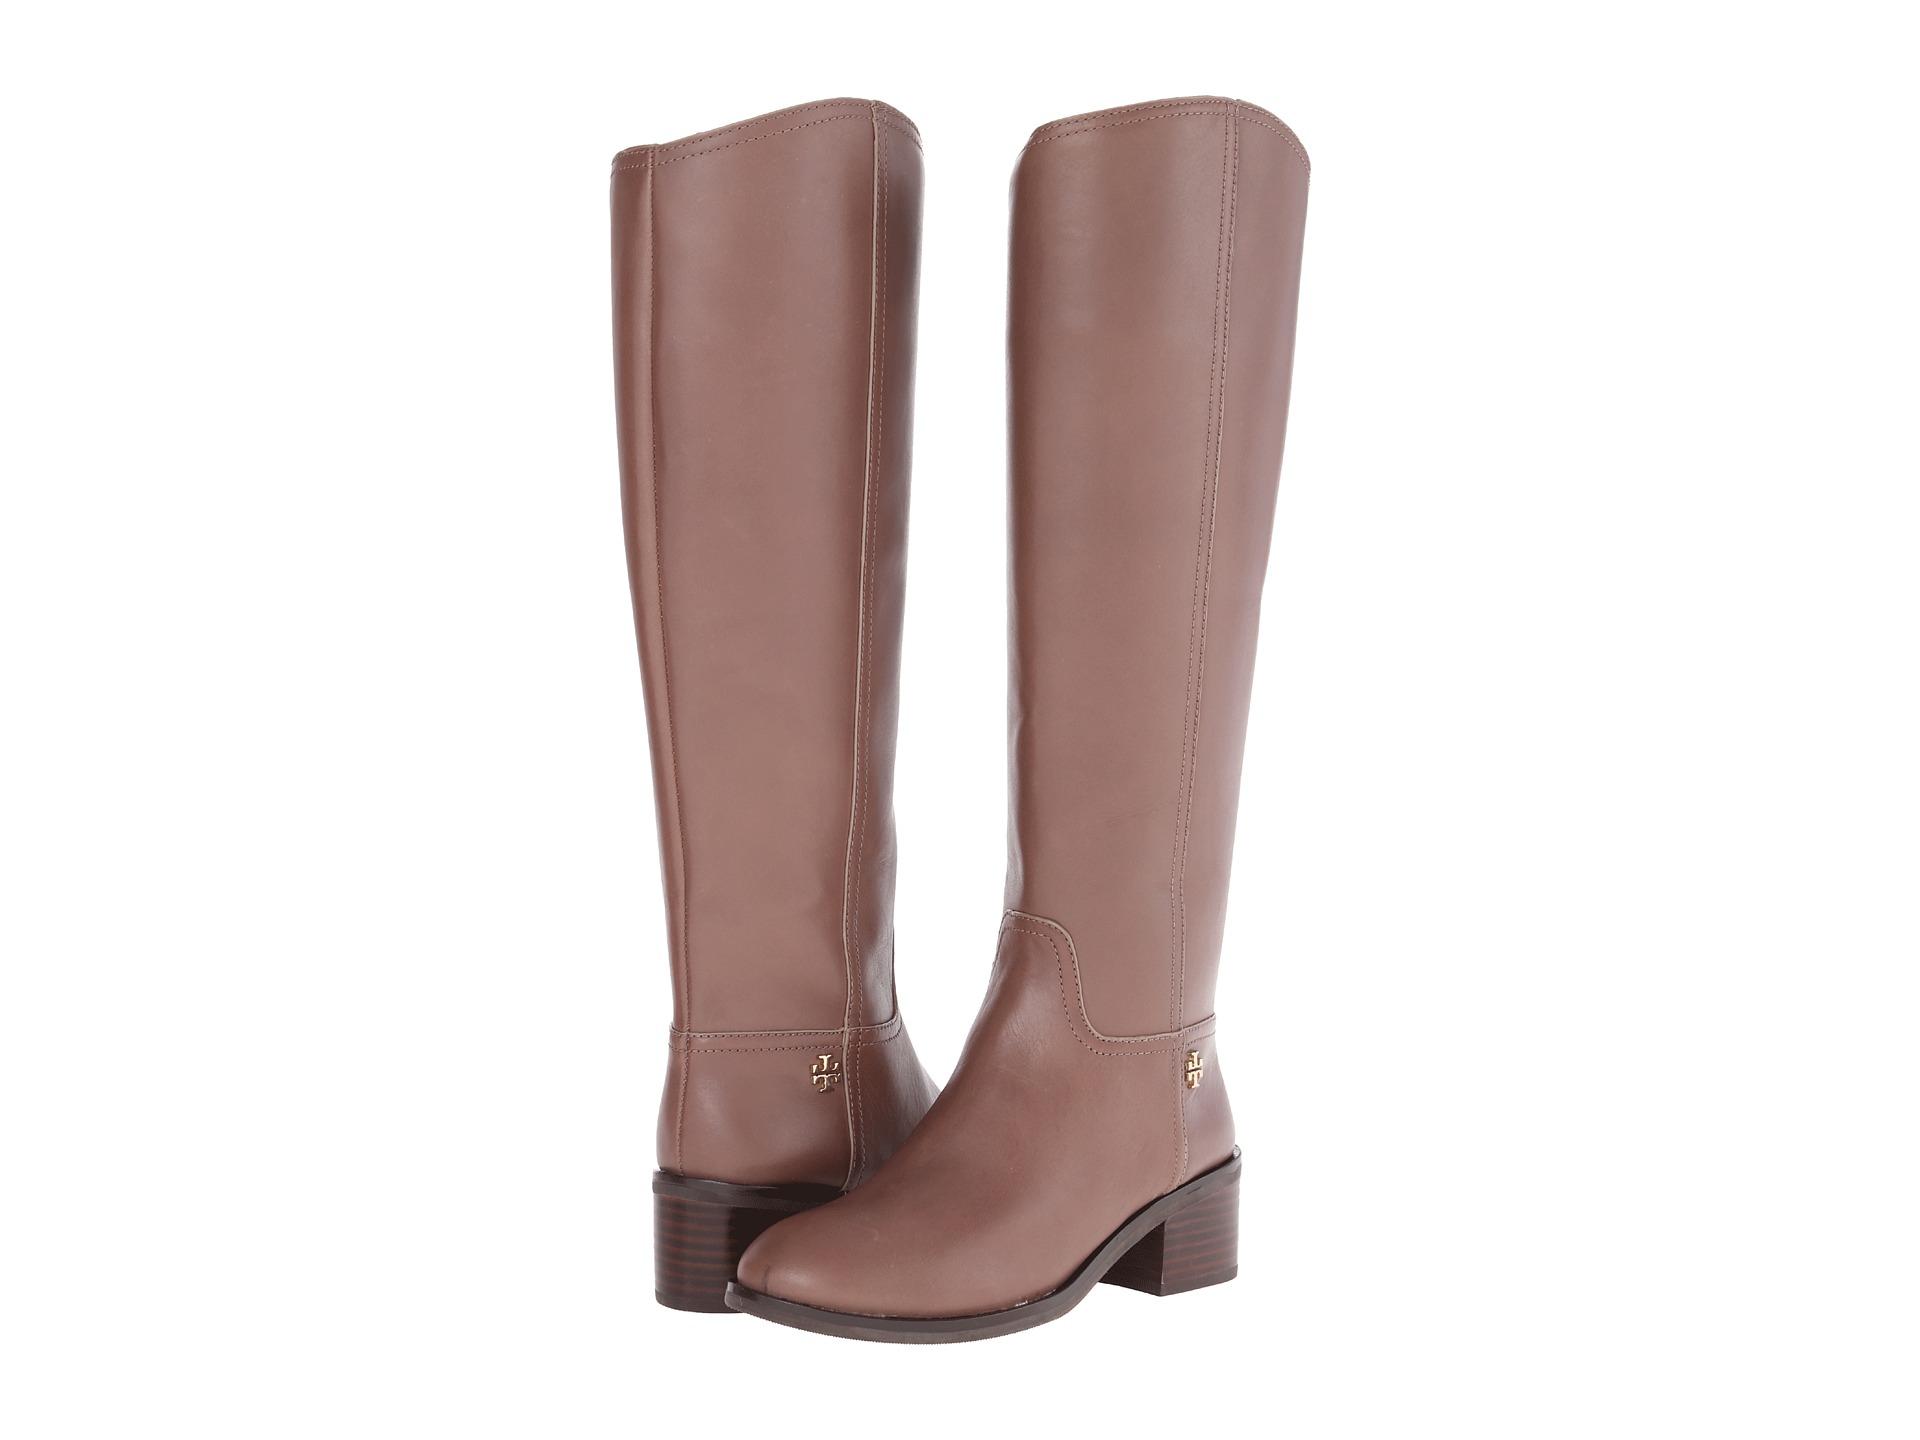 73dd458c997 Lyst - Tory Burch Fulton 55Mm Boot in Brown